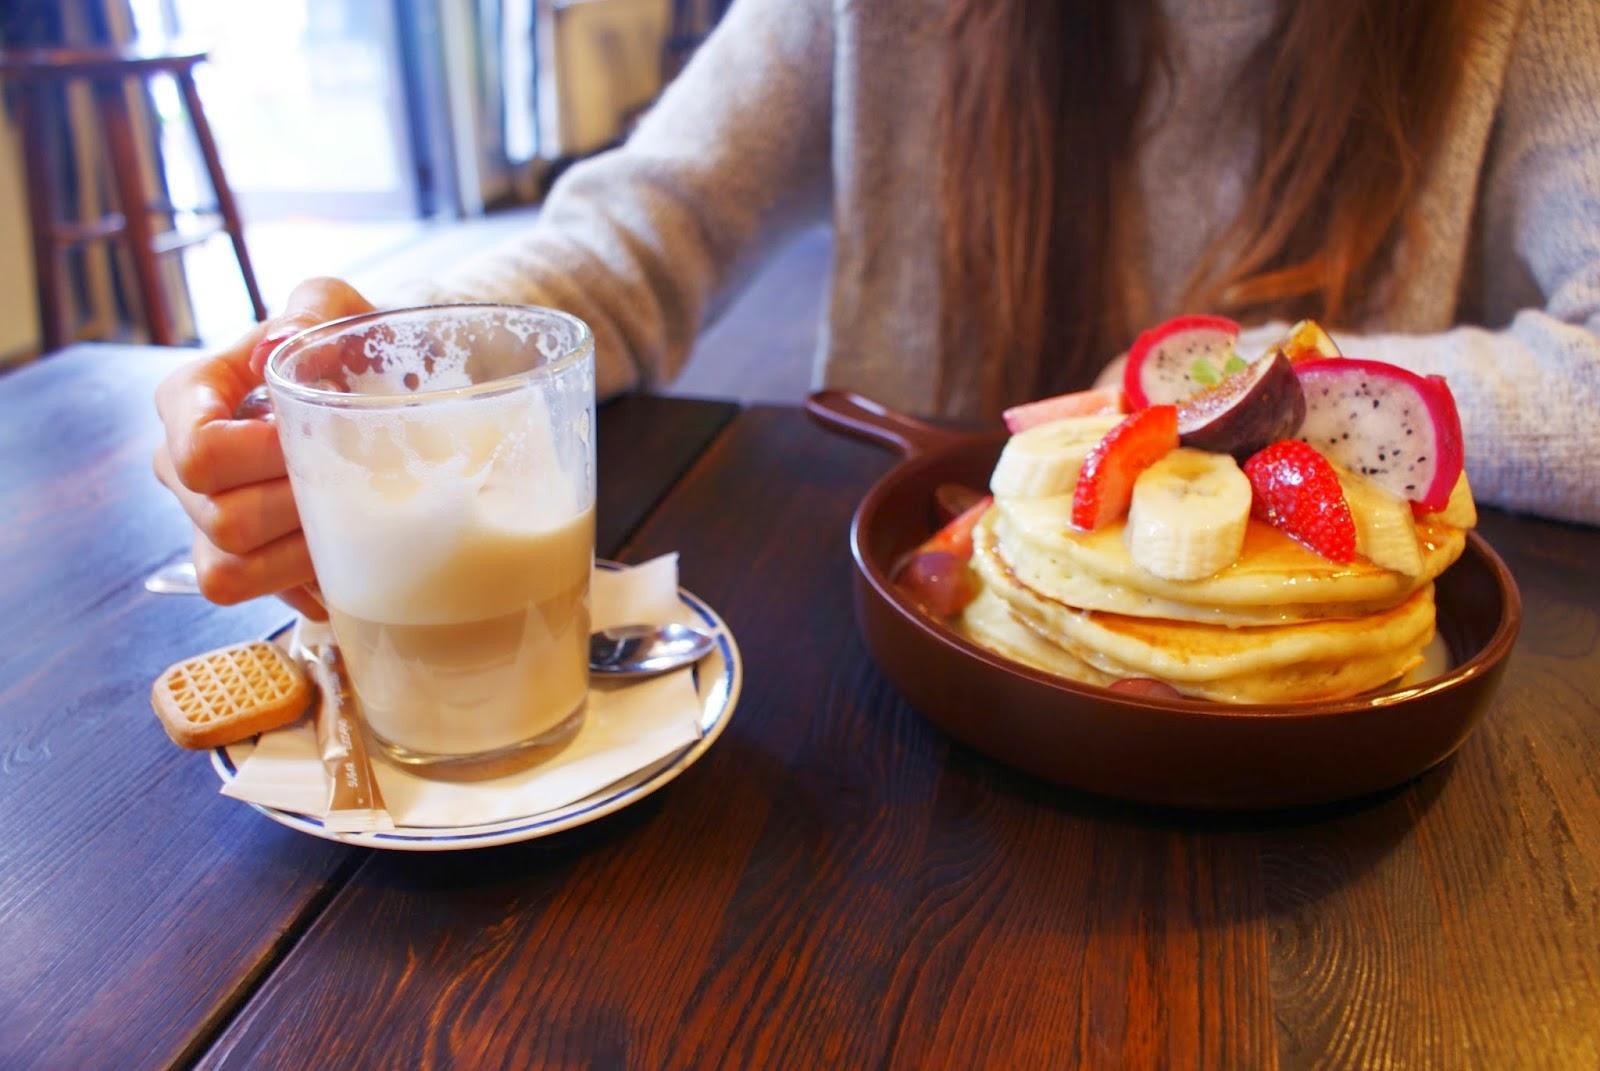 http://teczawsloiku.blogspot.com/2014/09/central-cafe-najlepsze-sniadanie-we.html